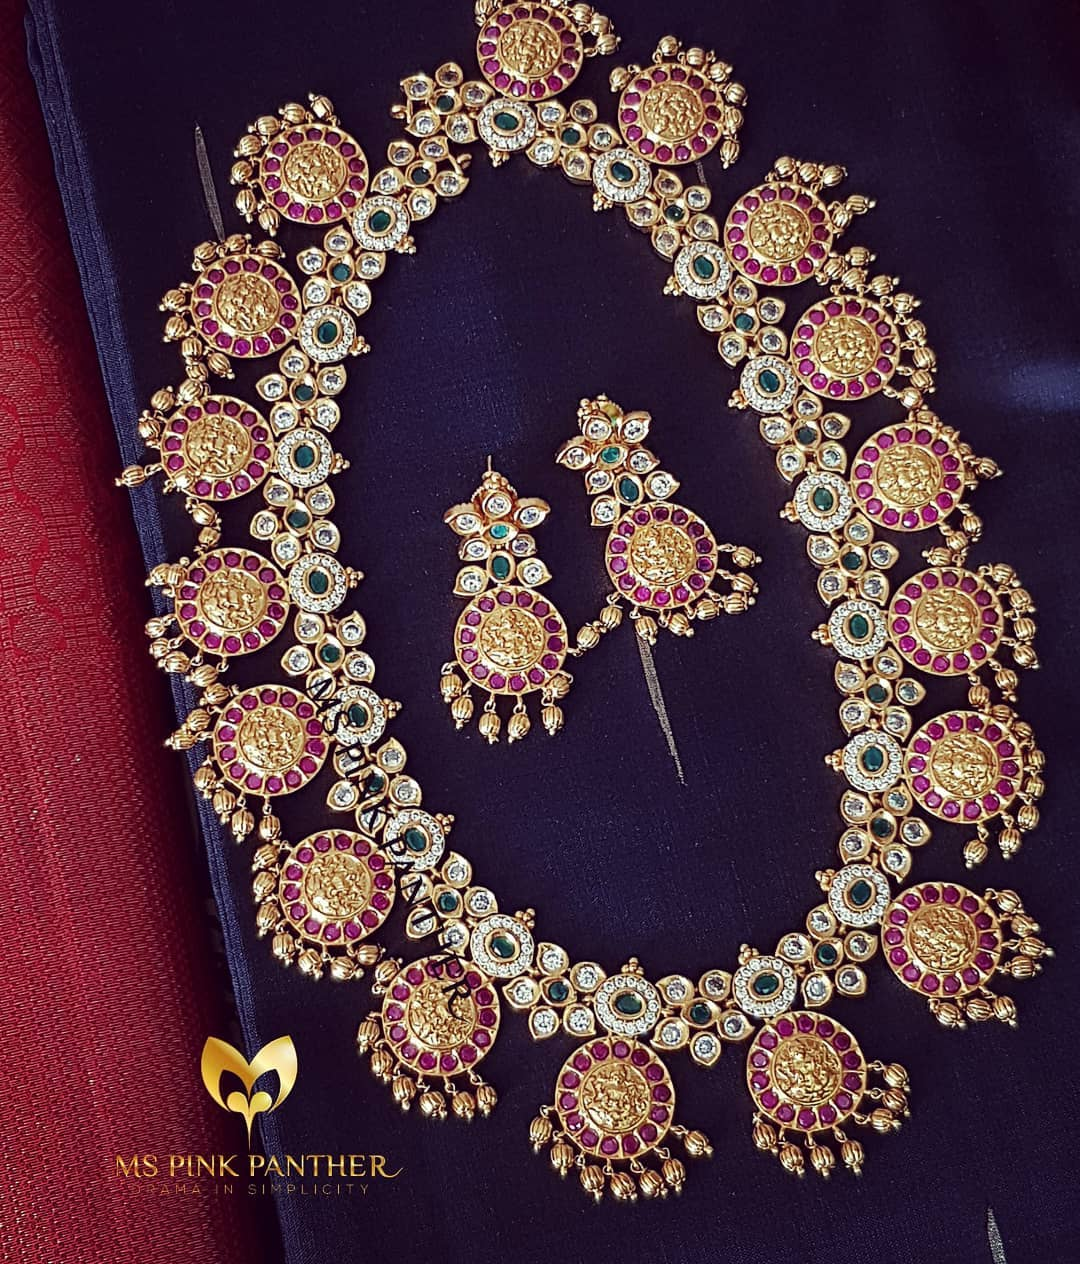 Elegant Neklace Set From Ms Pink Panthers